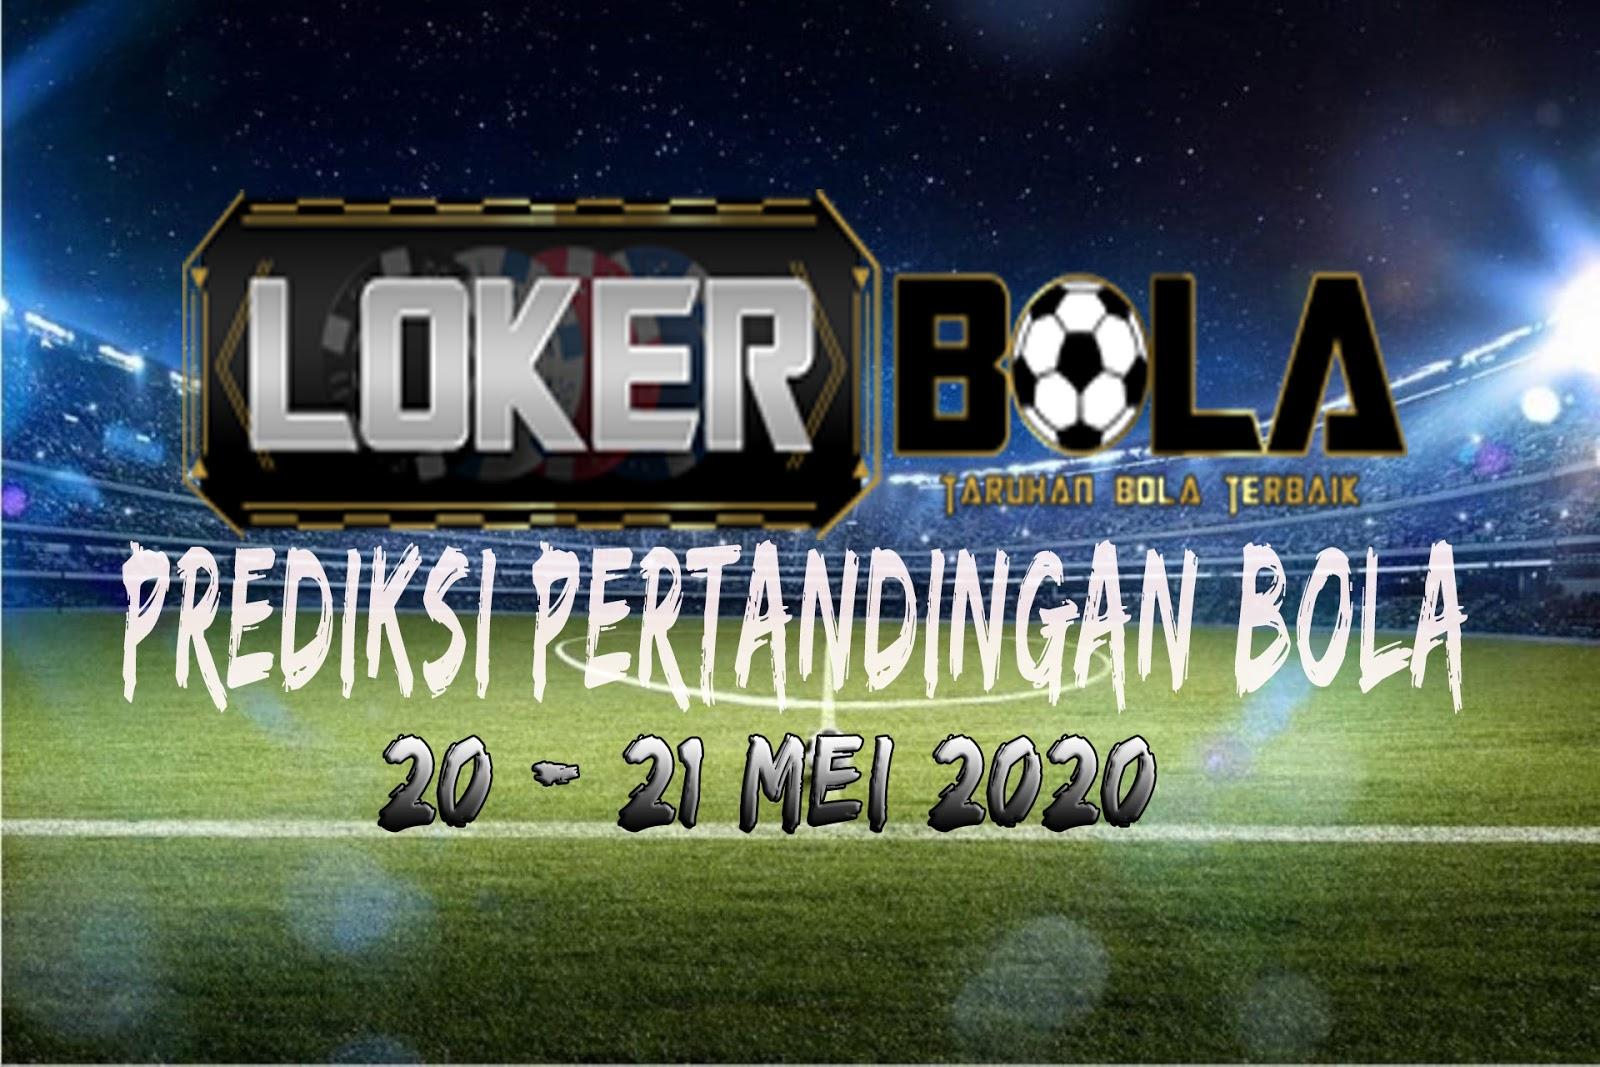 PREDIKSI PERTANDINGAN BOLA 20 – 21 May 2020